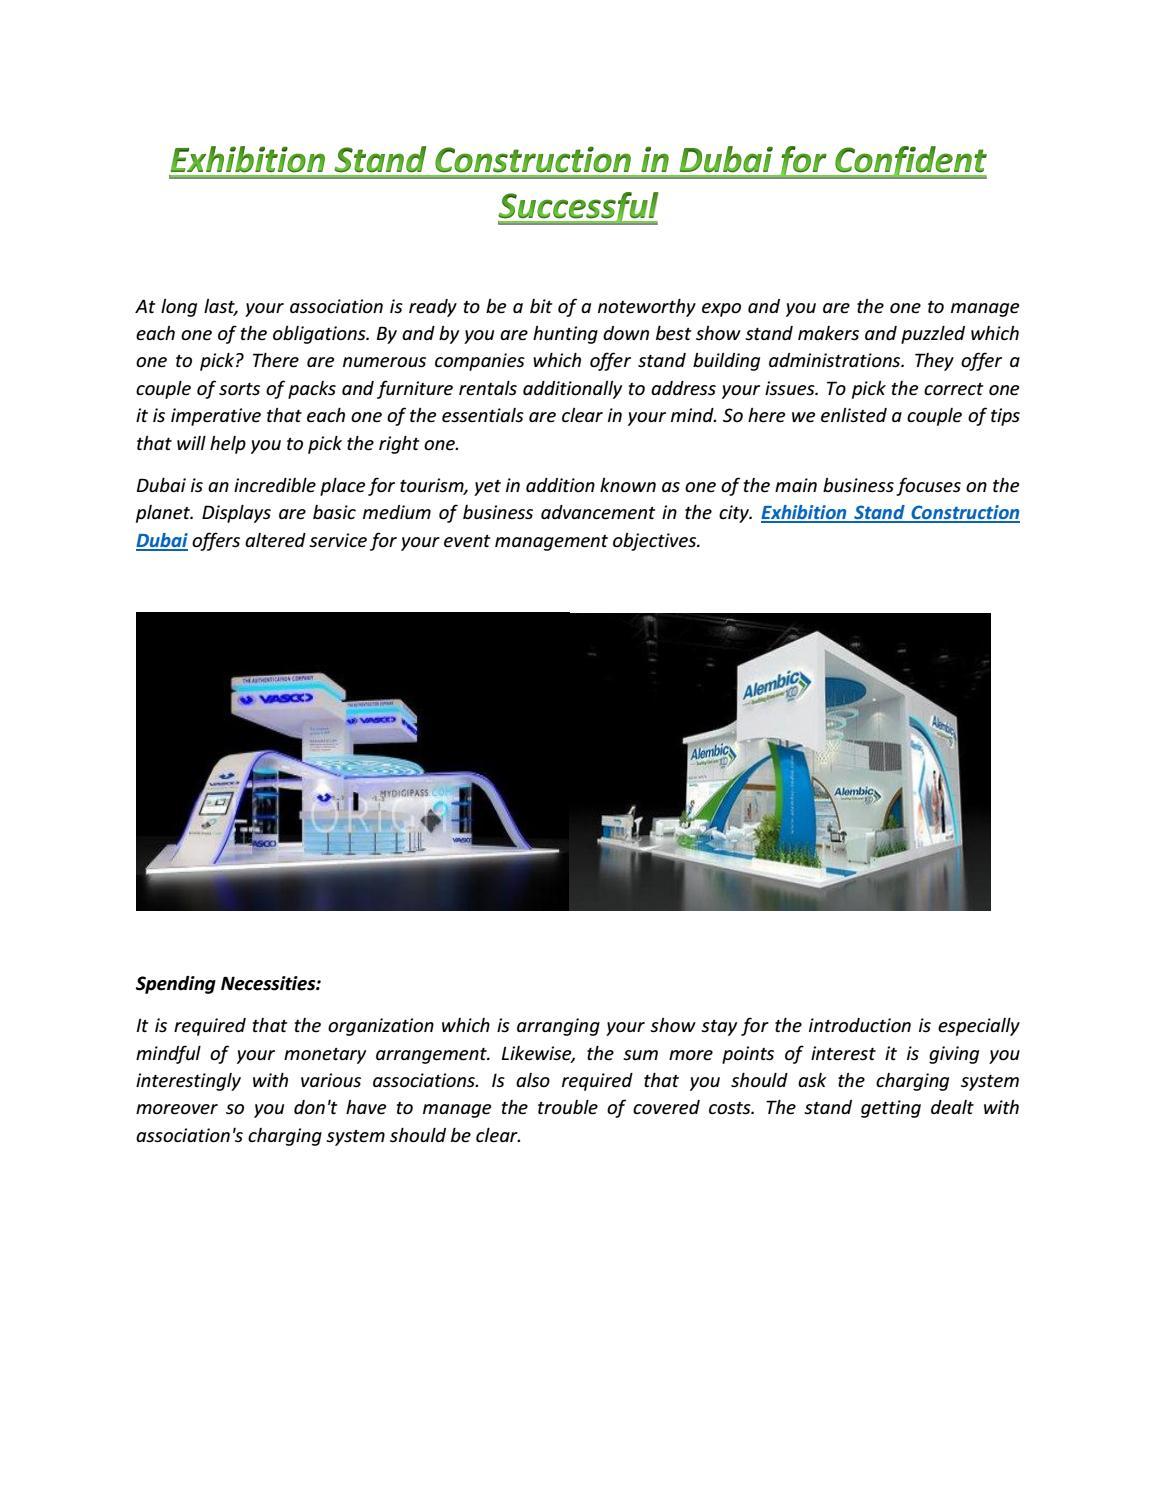 Exhibition stand construction in dubai for confident successful